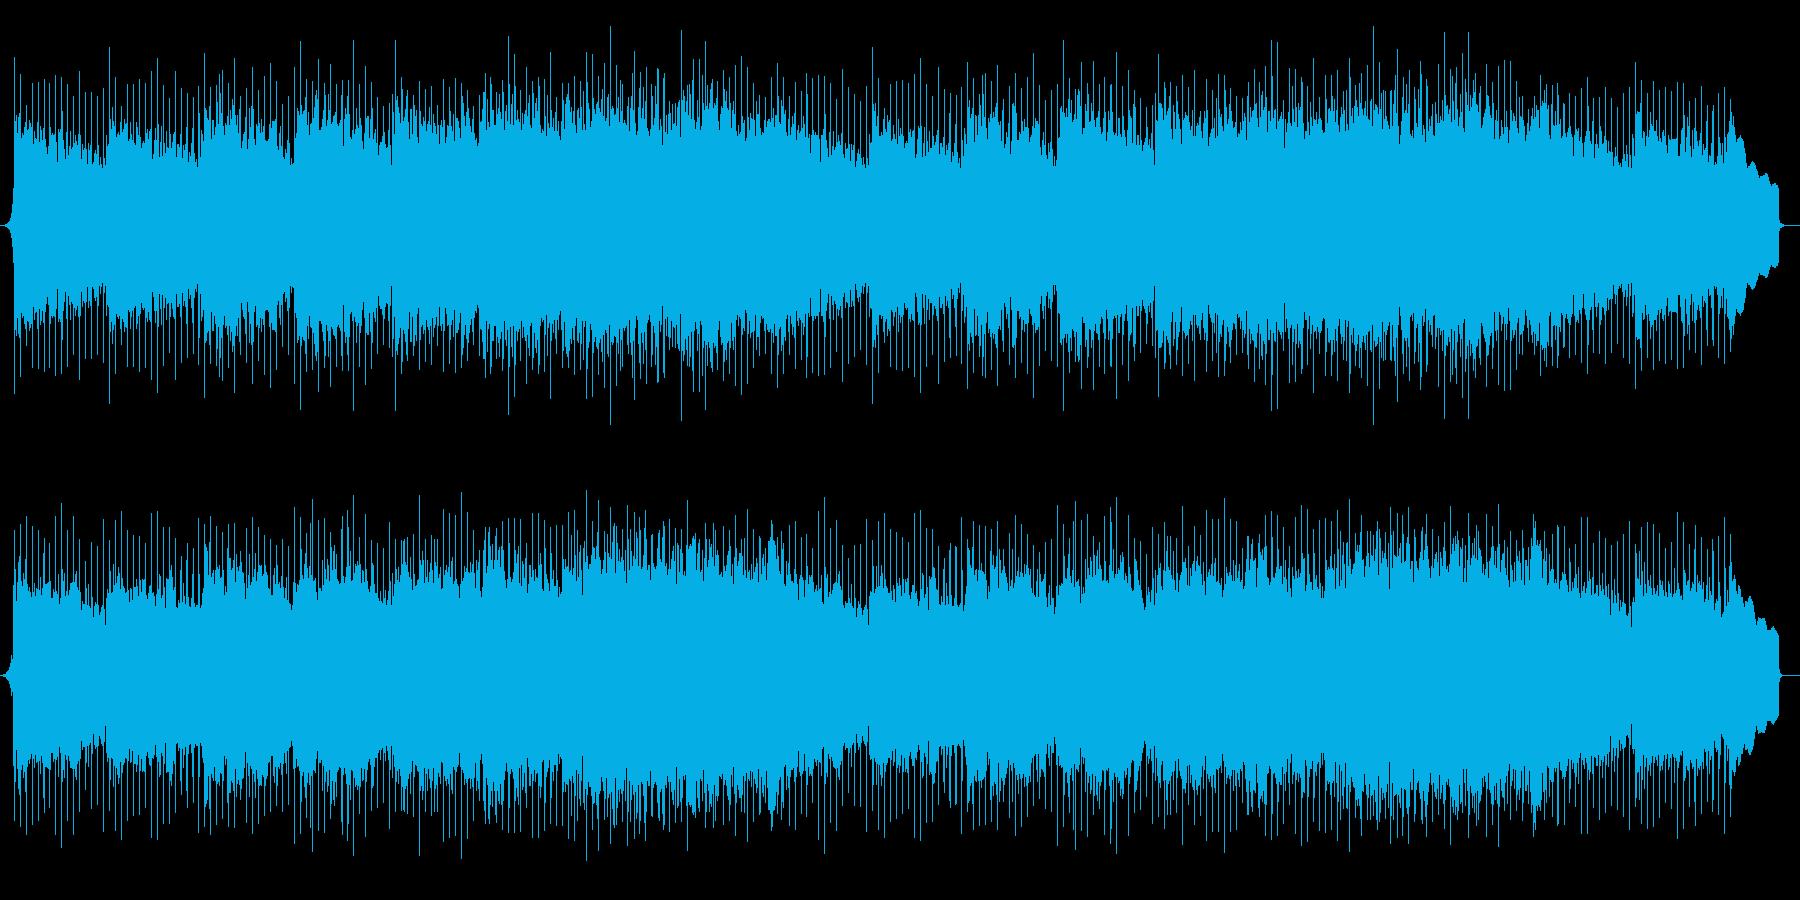 「Happier」 Acoustic Guitar Pop's reproduced waveform